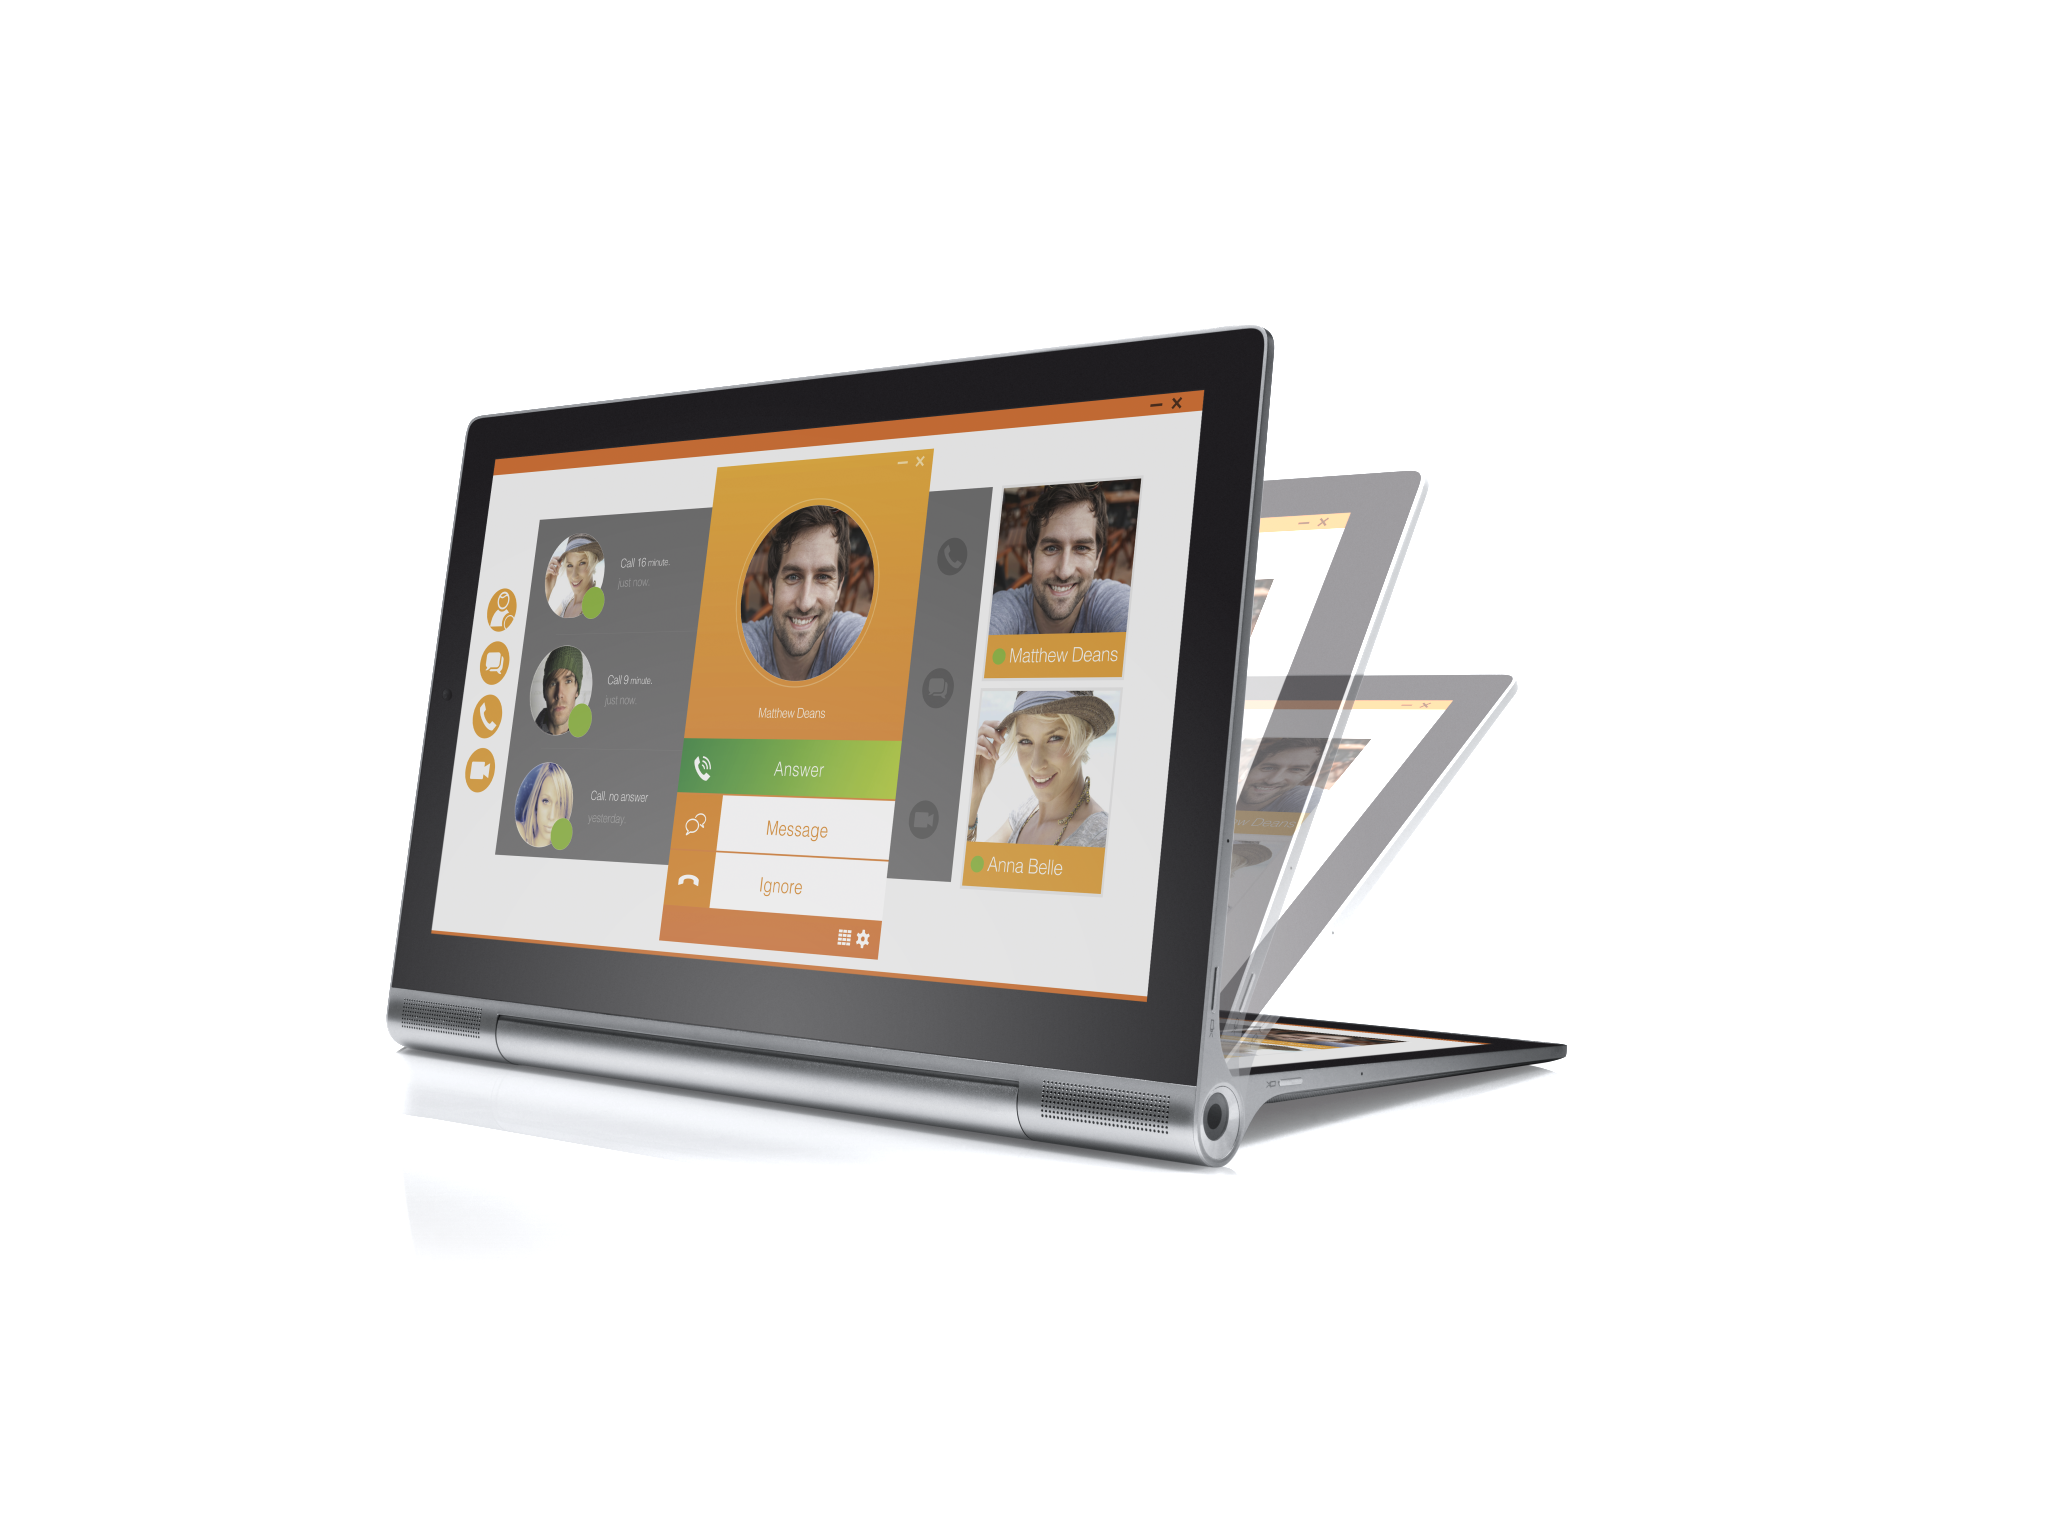 Lenovo yoga tablet2 Pro